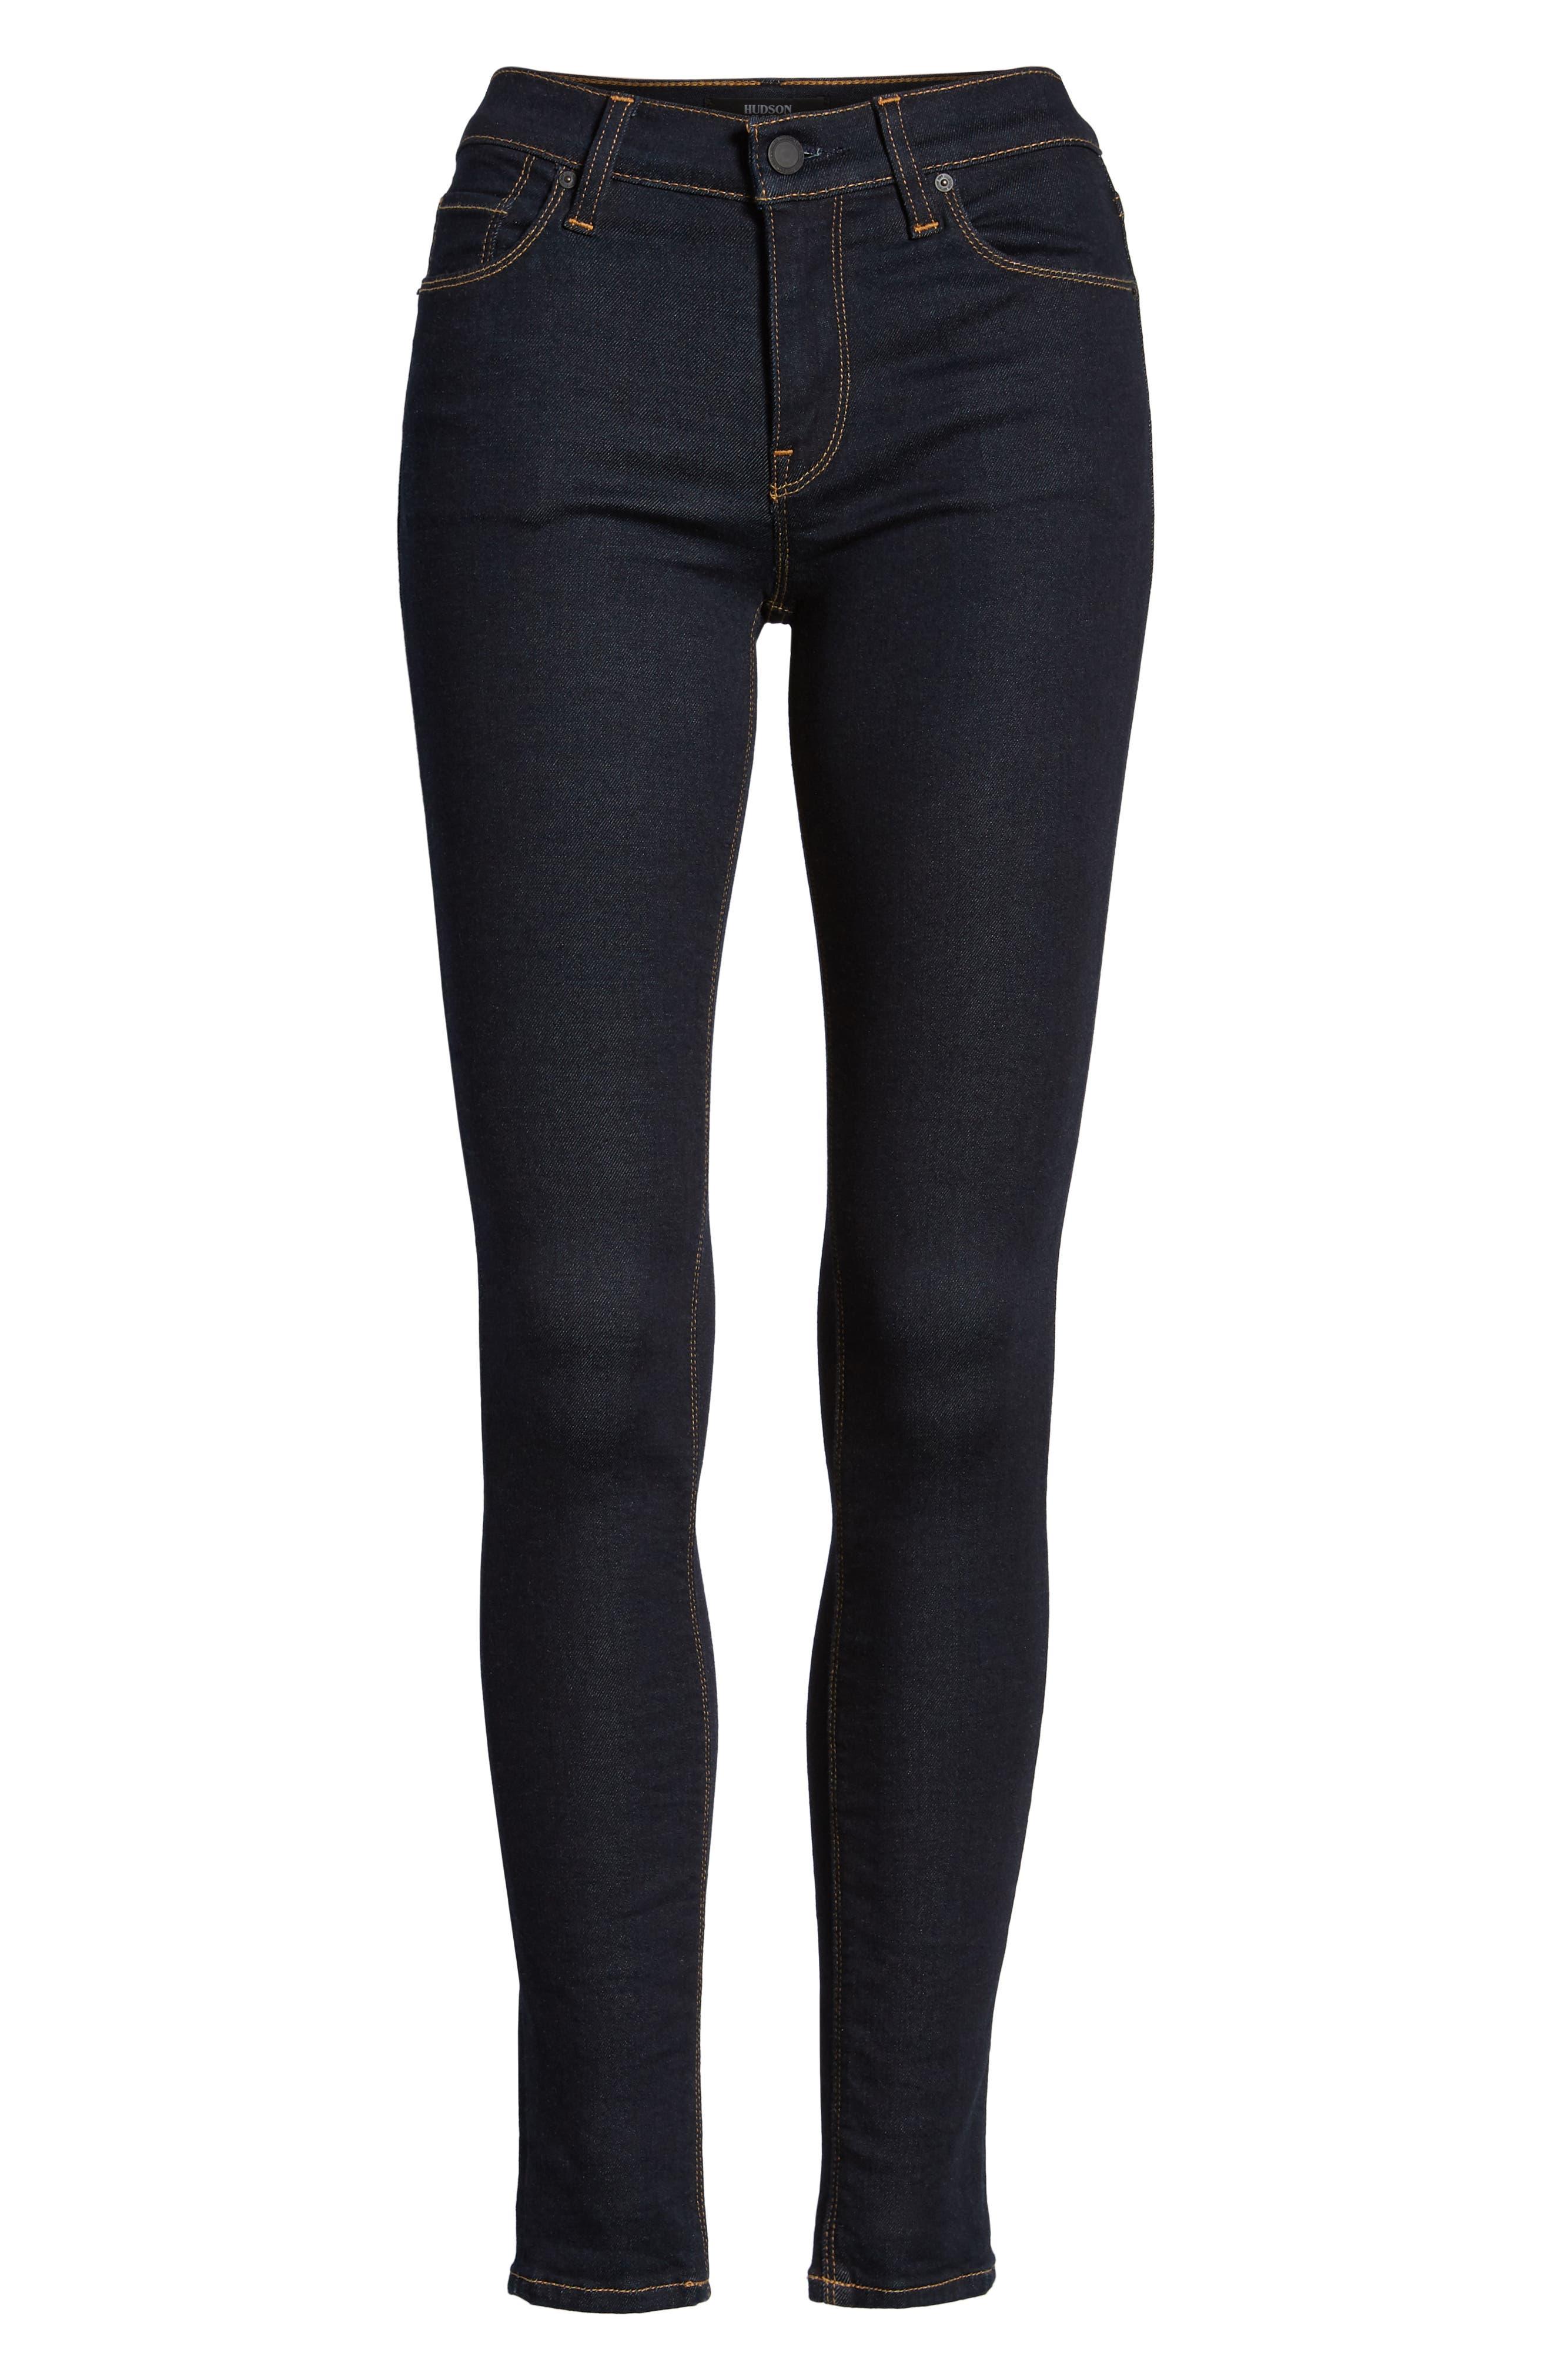 Nico Super Skinny Jeans,                             Alternate thumbnail 7, color,                             SUNSET BLVD